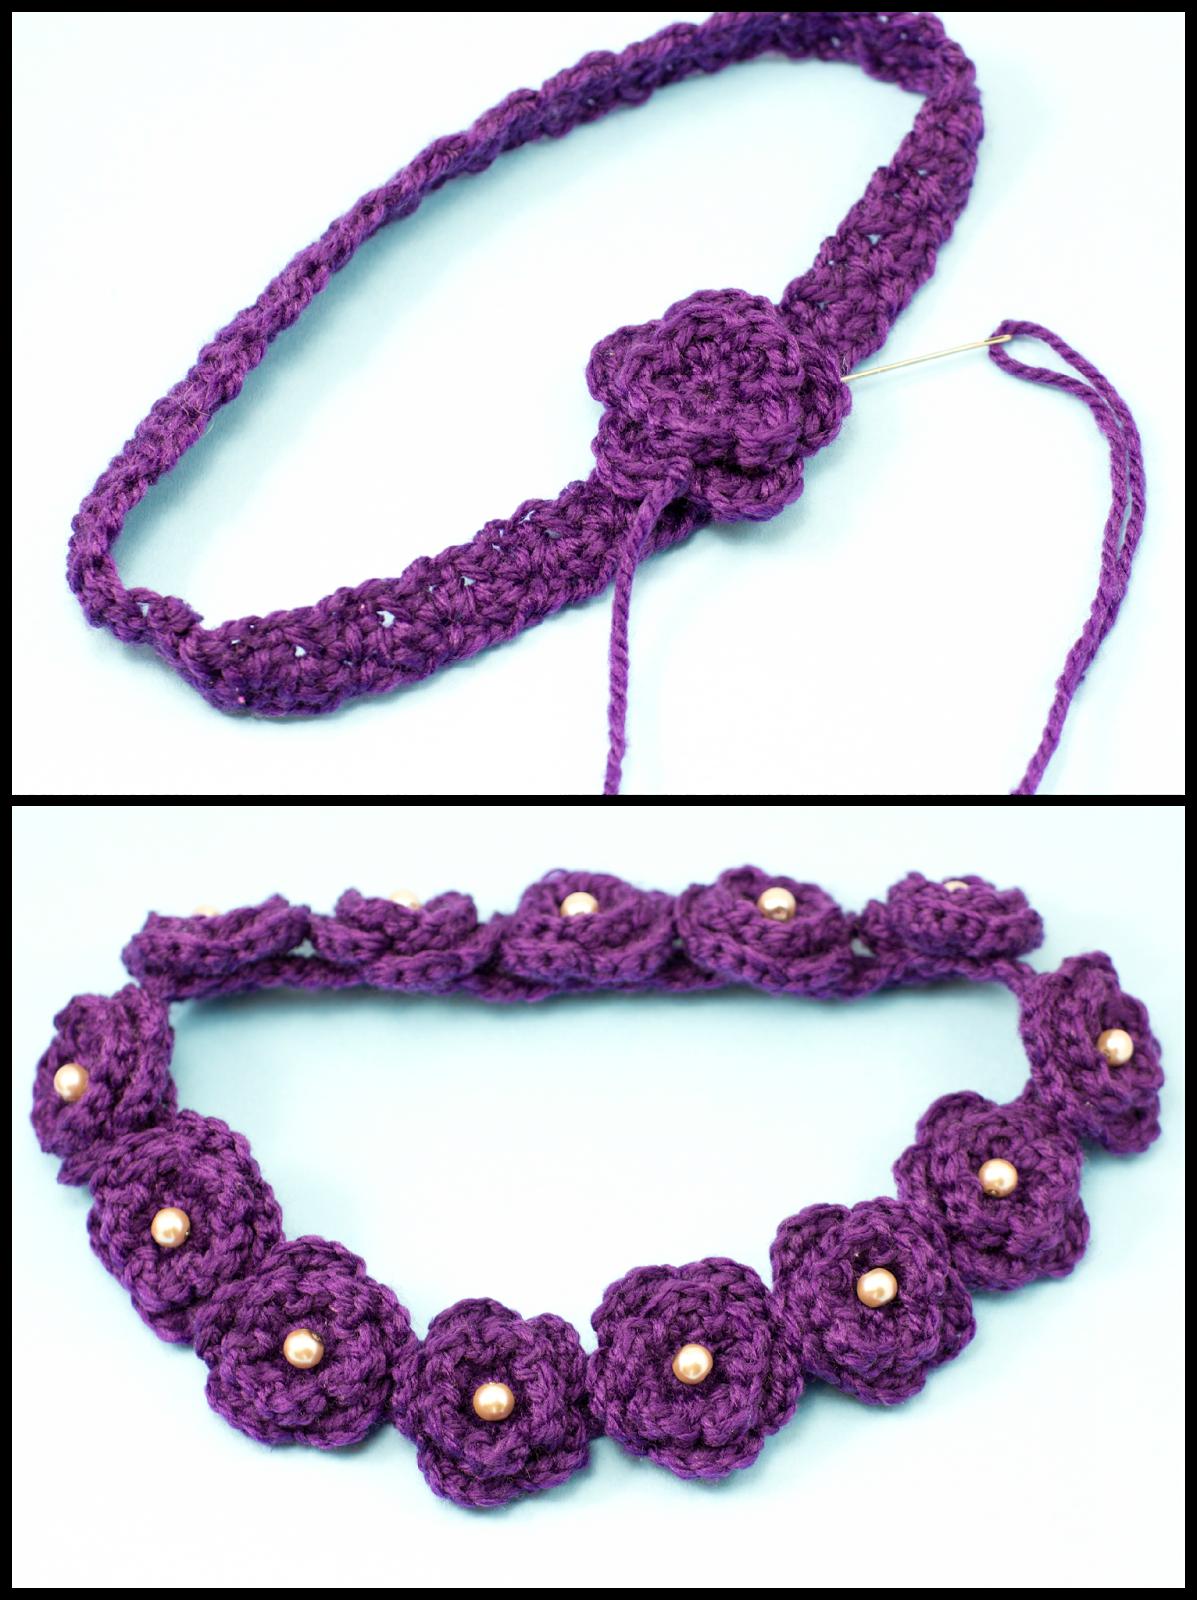 Daisy flower crown crochet pattern hopeful honey flower crowns daisy flower crown crochet pattern via hopeful honey izmirmasajfo